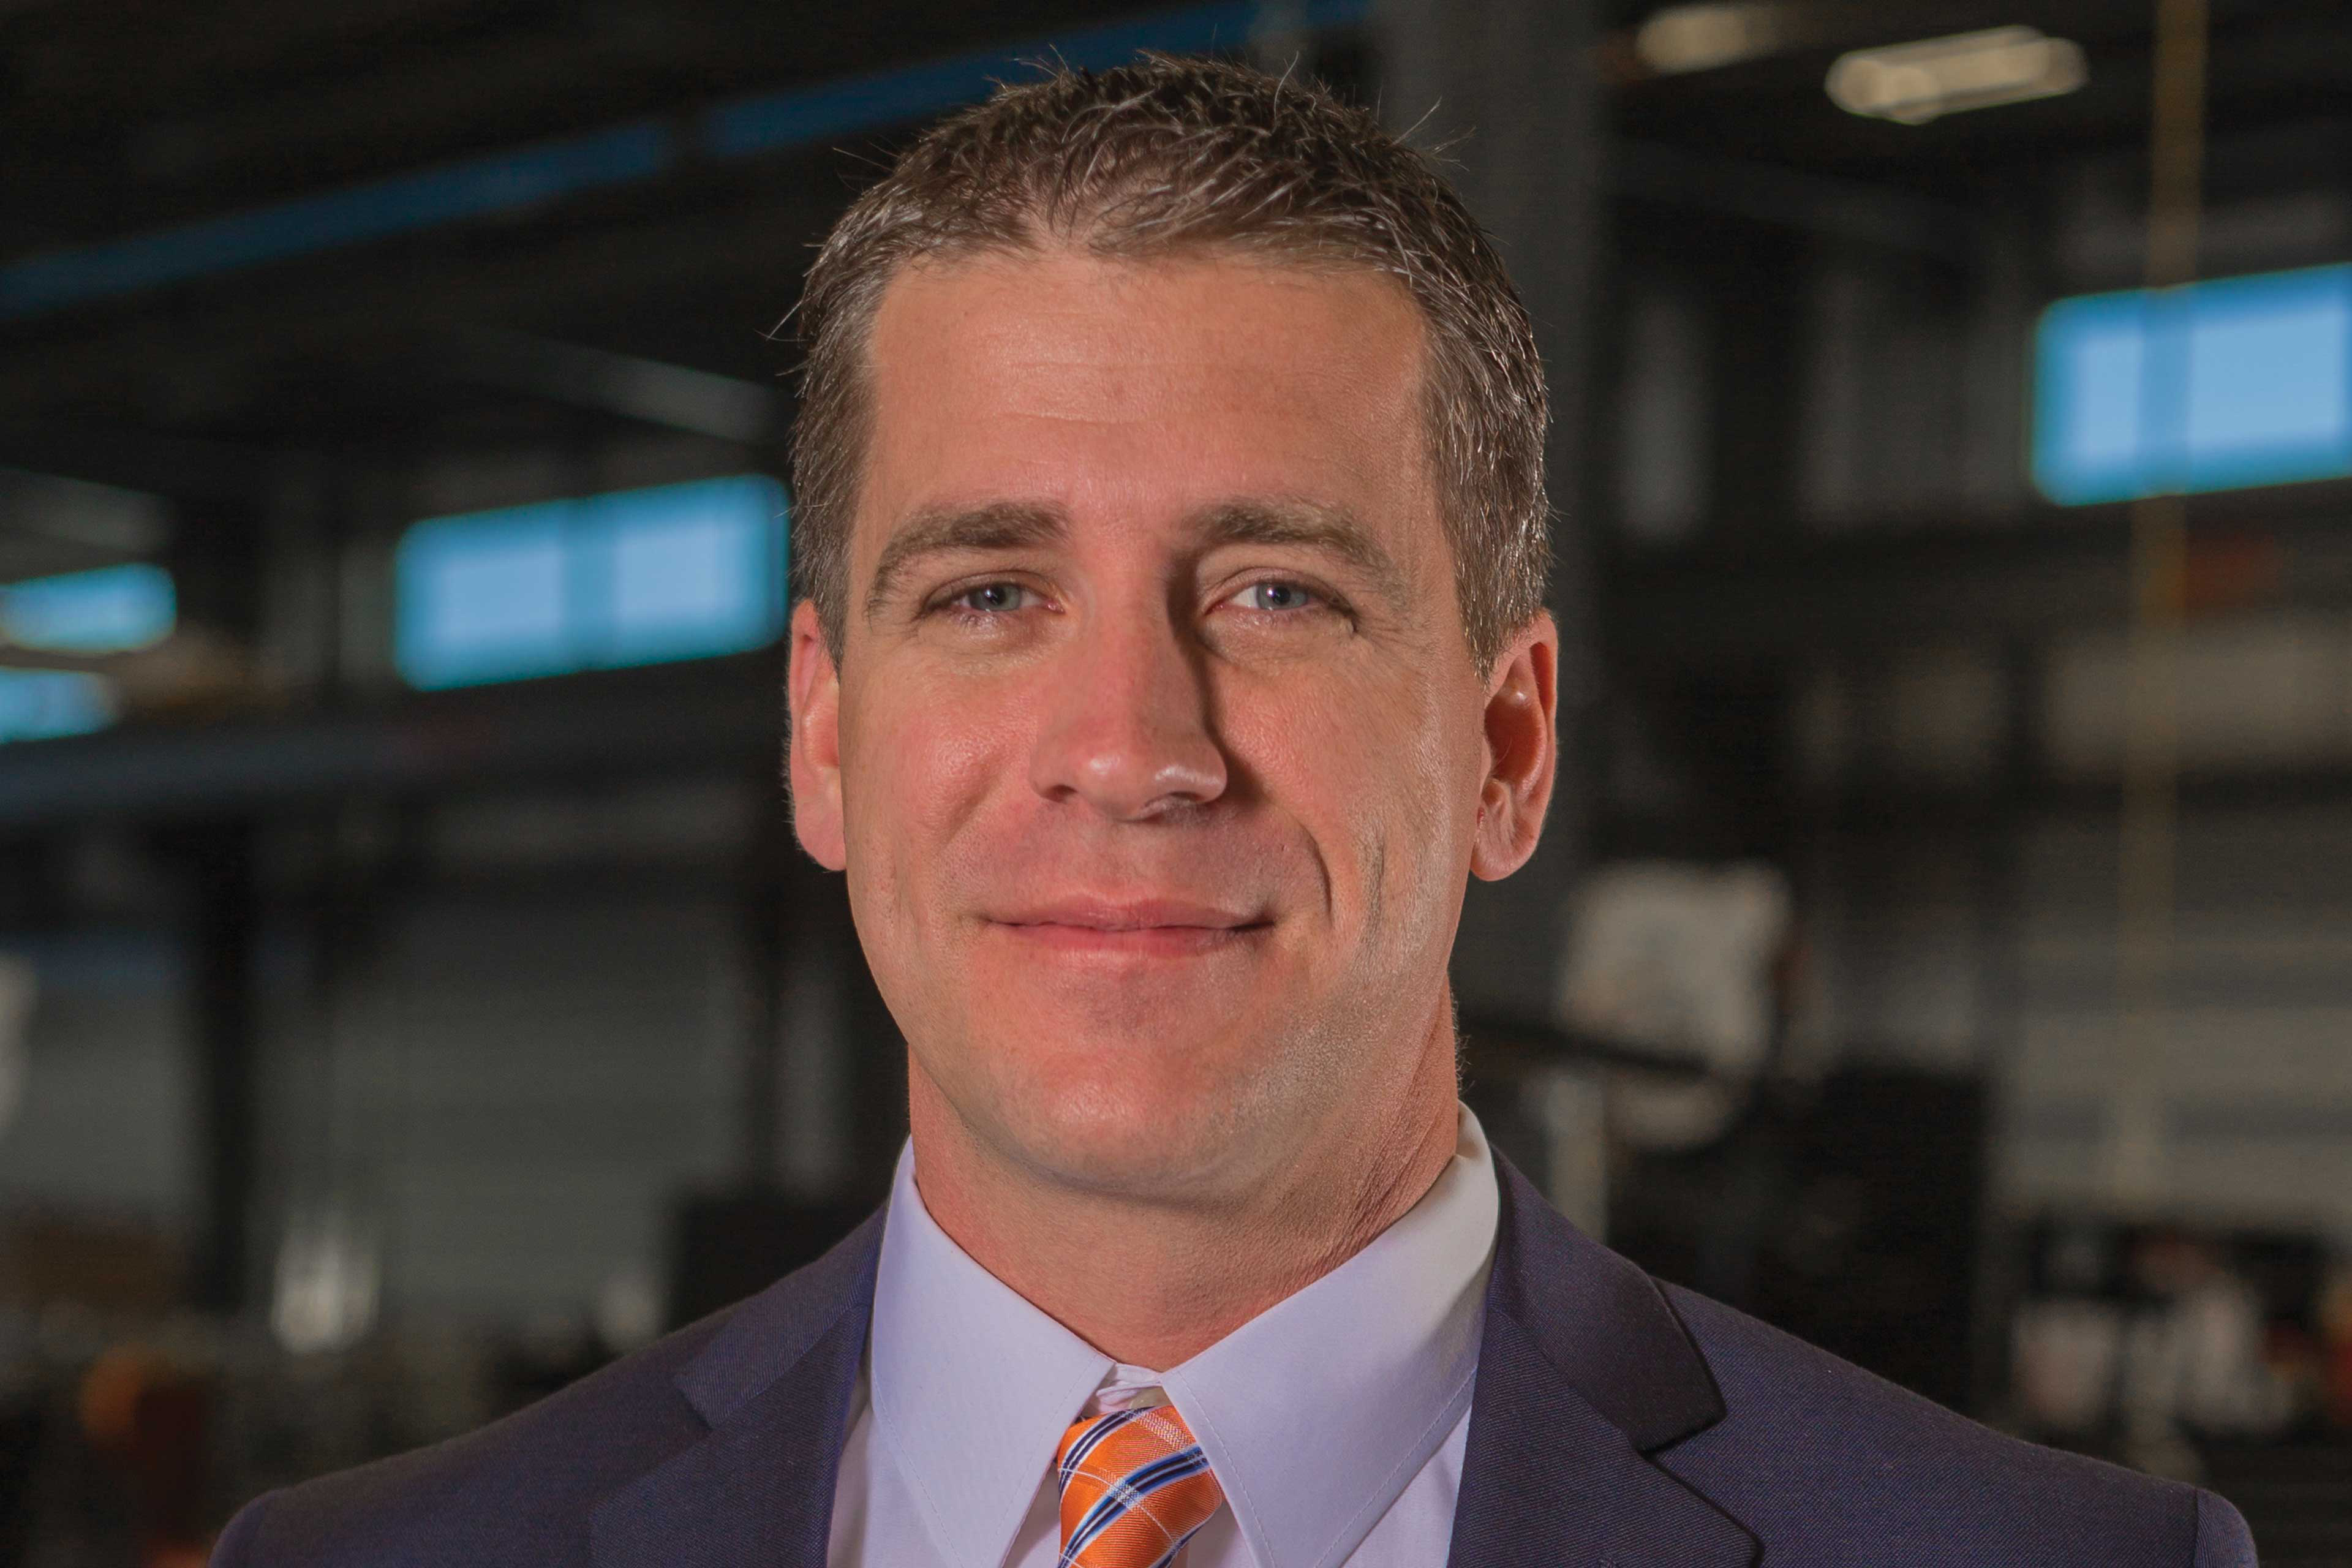 Scott Gromer, CEO, Mesa Natural Gas Solutions